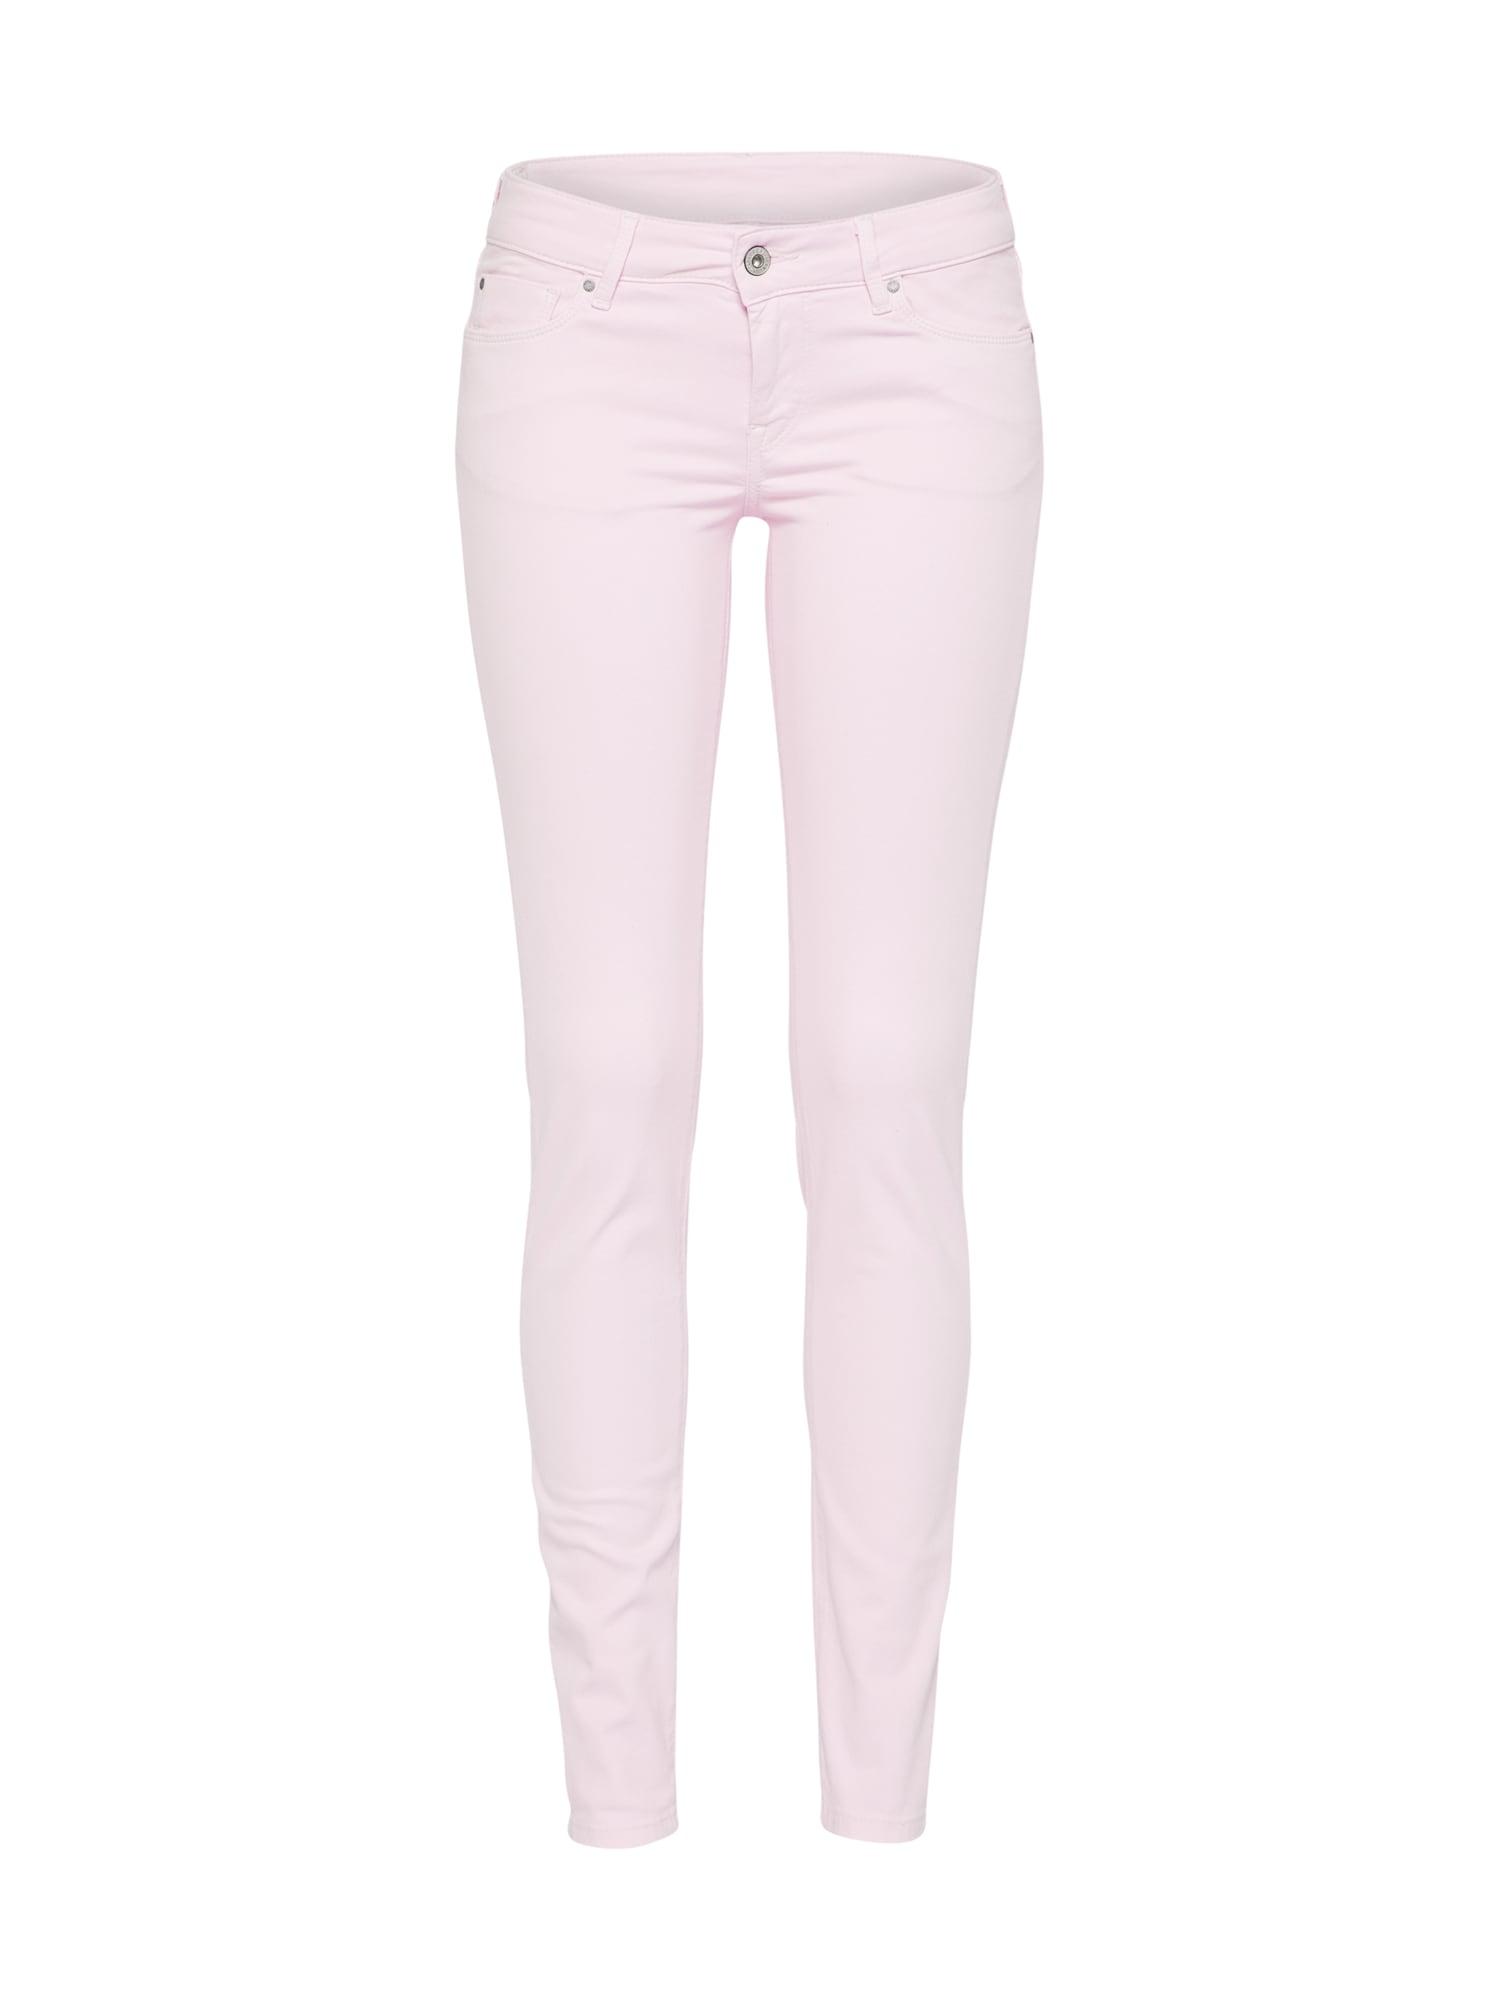 Pepe Jeans Dames Broek Soho rosa